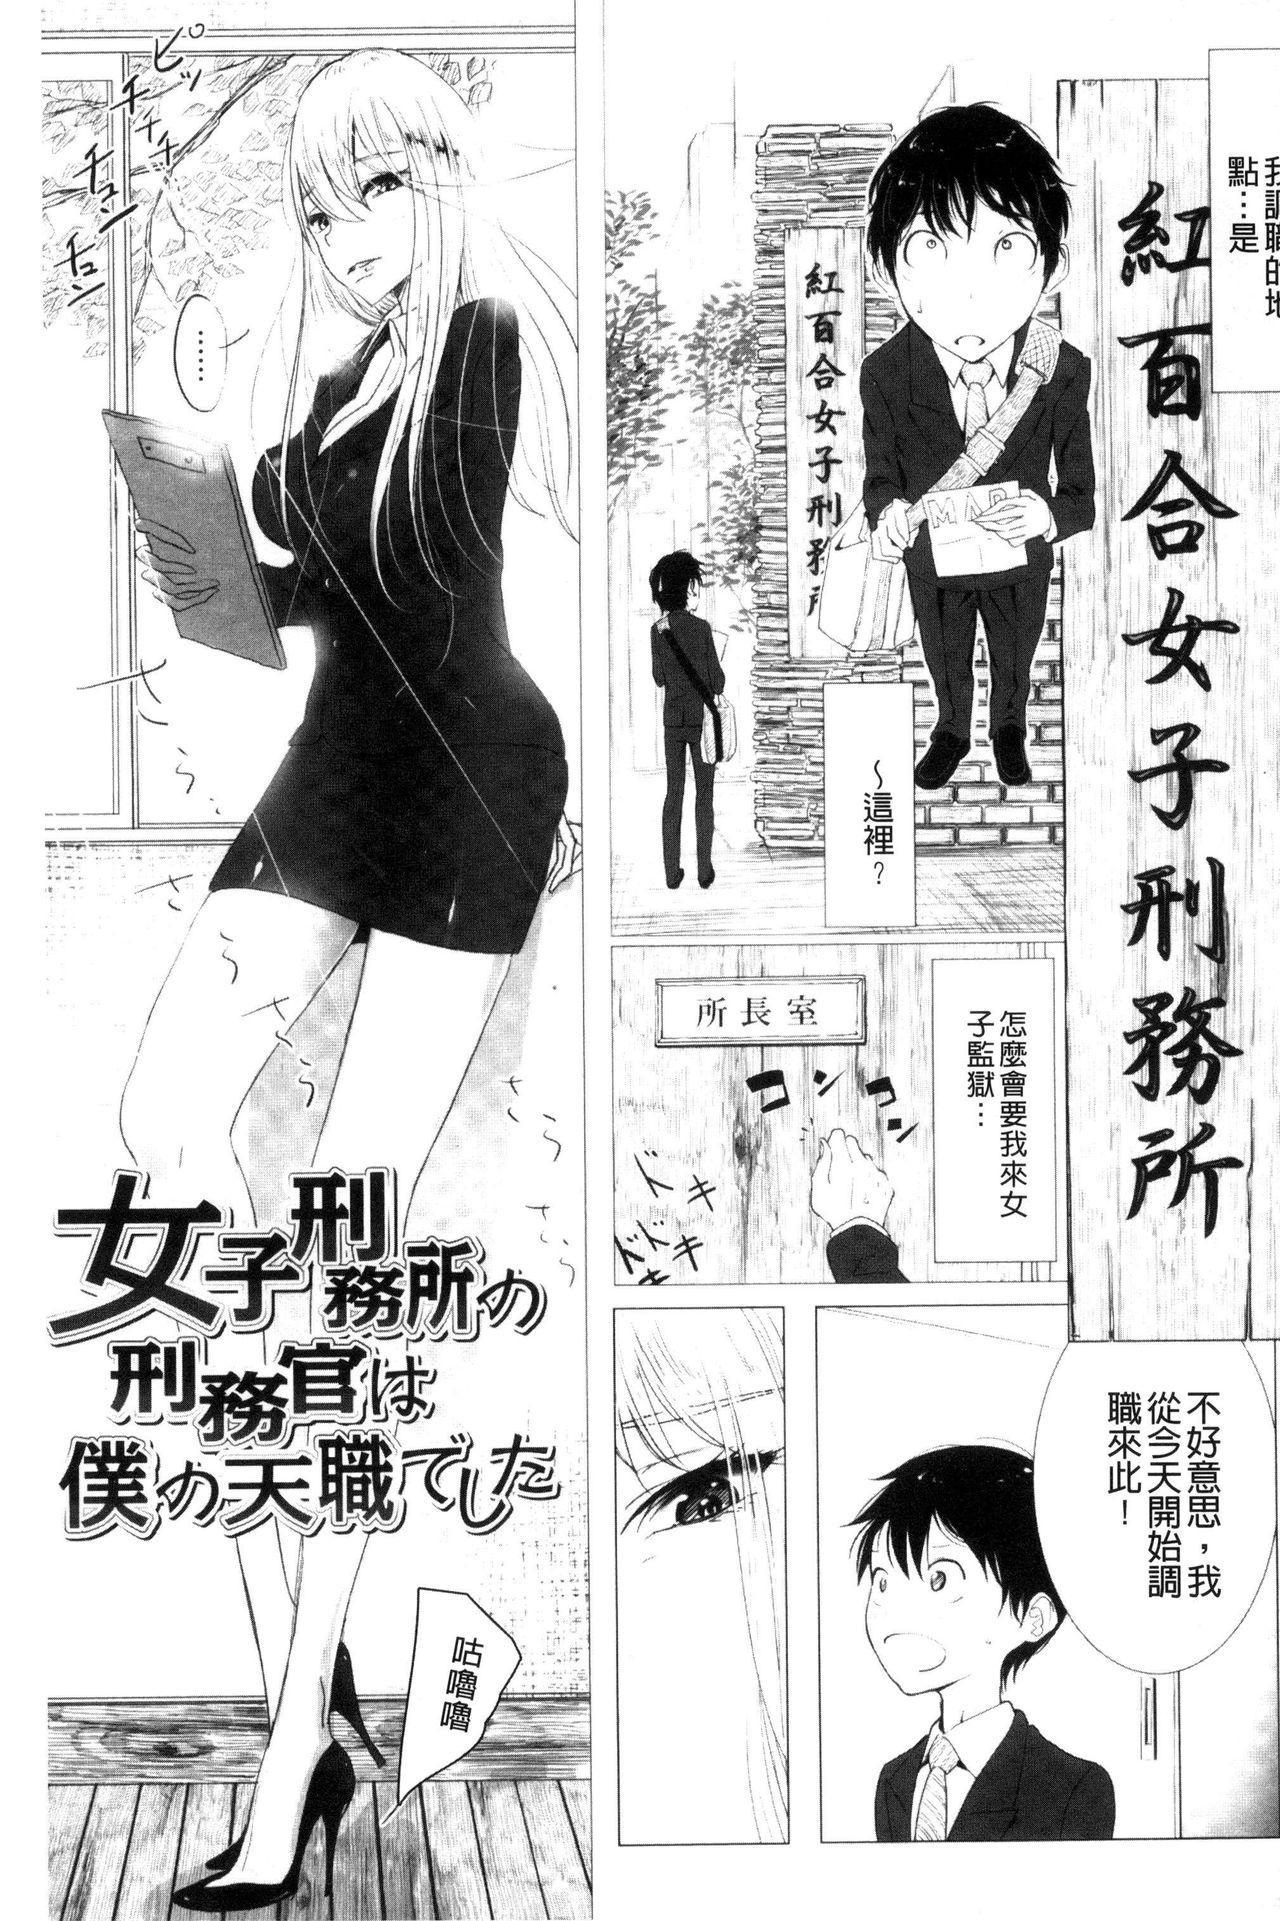 [Dhibi] Sono Yubisaki de Korogashite - Please Caress it at the Finger-tip. [Chinese] 156